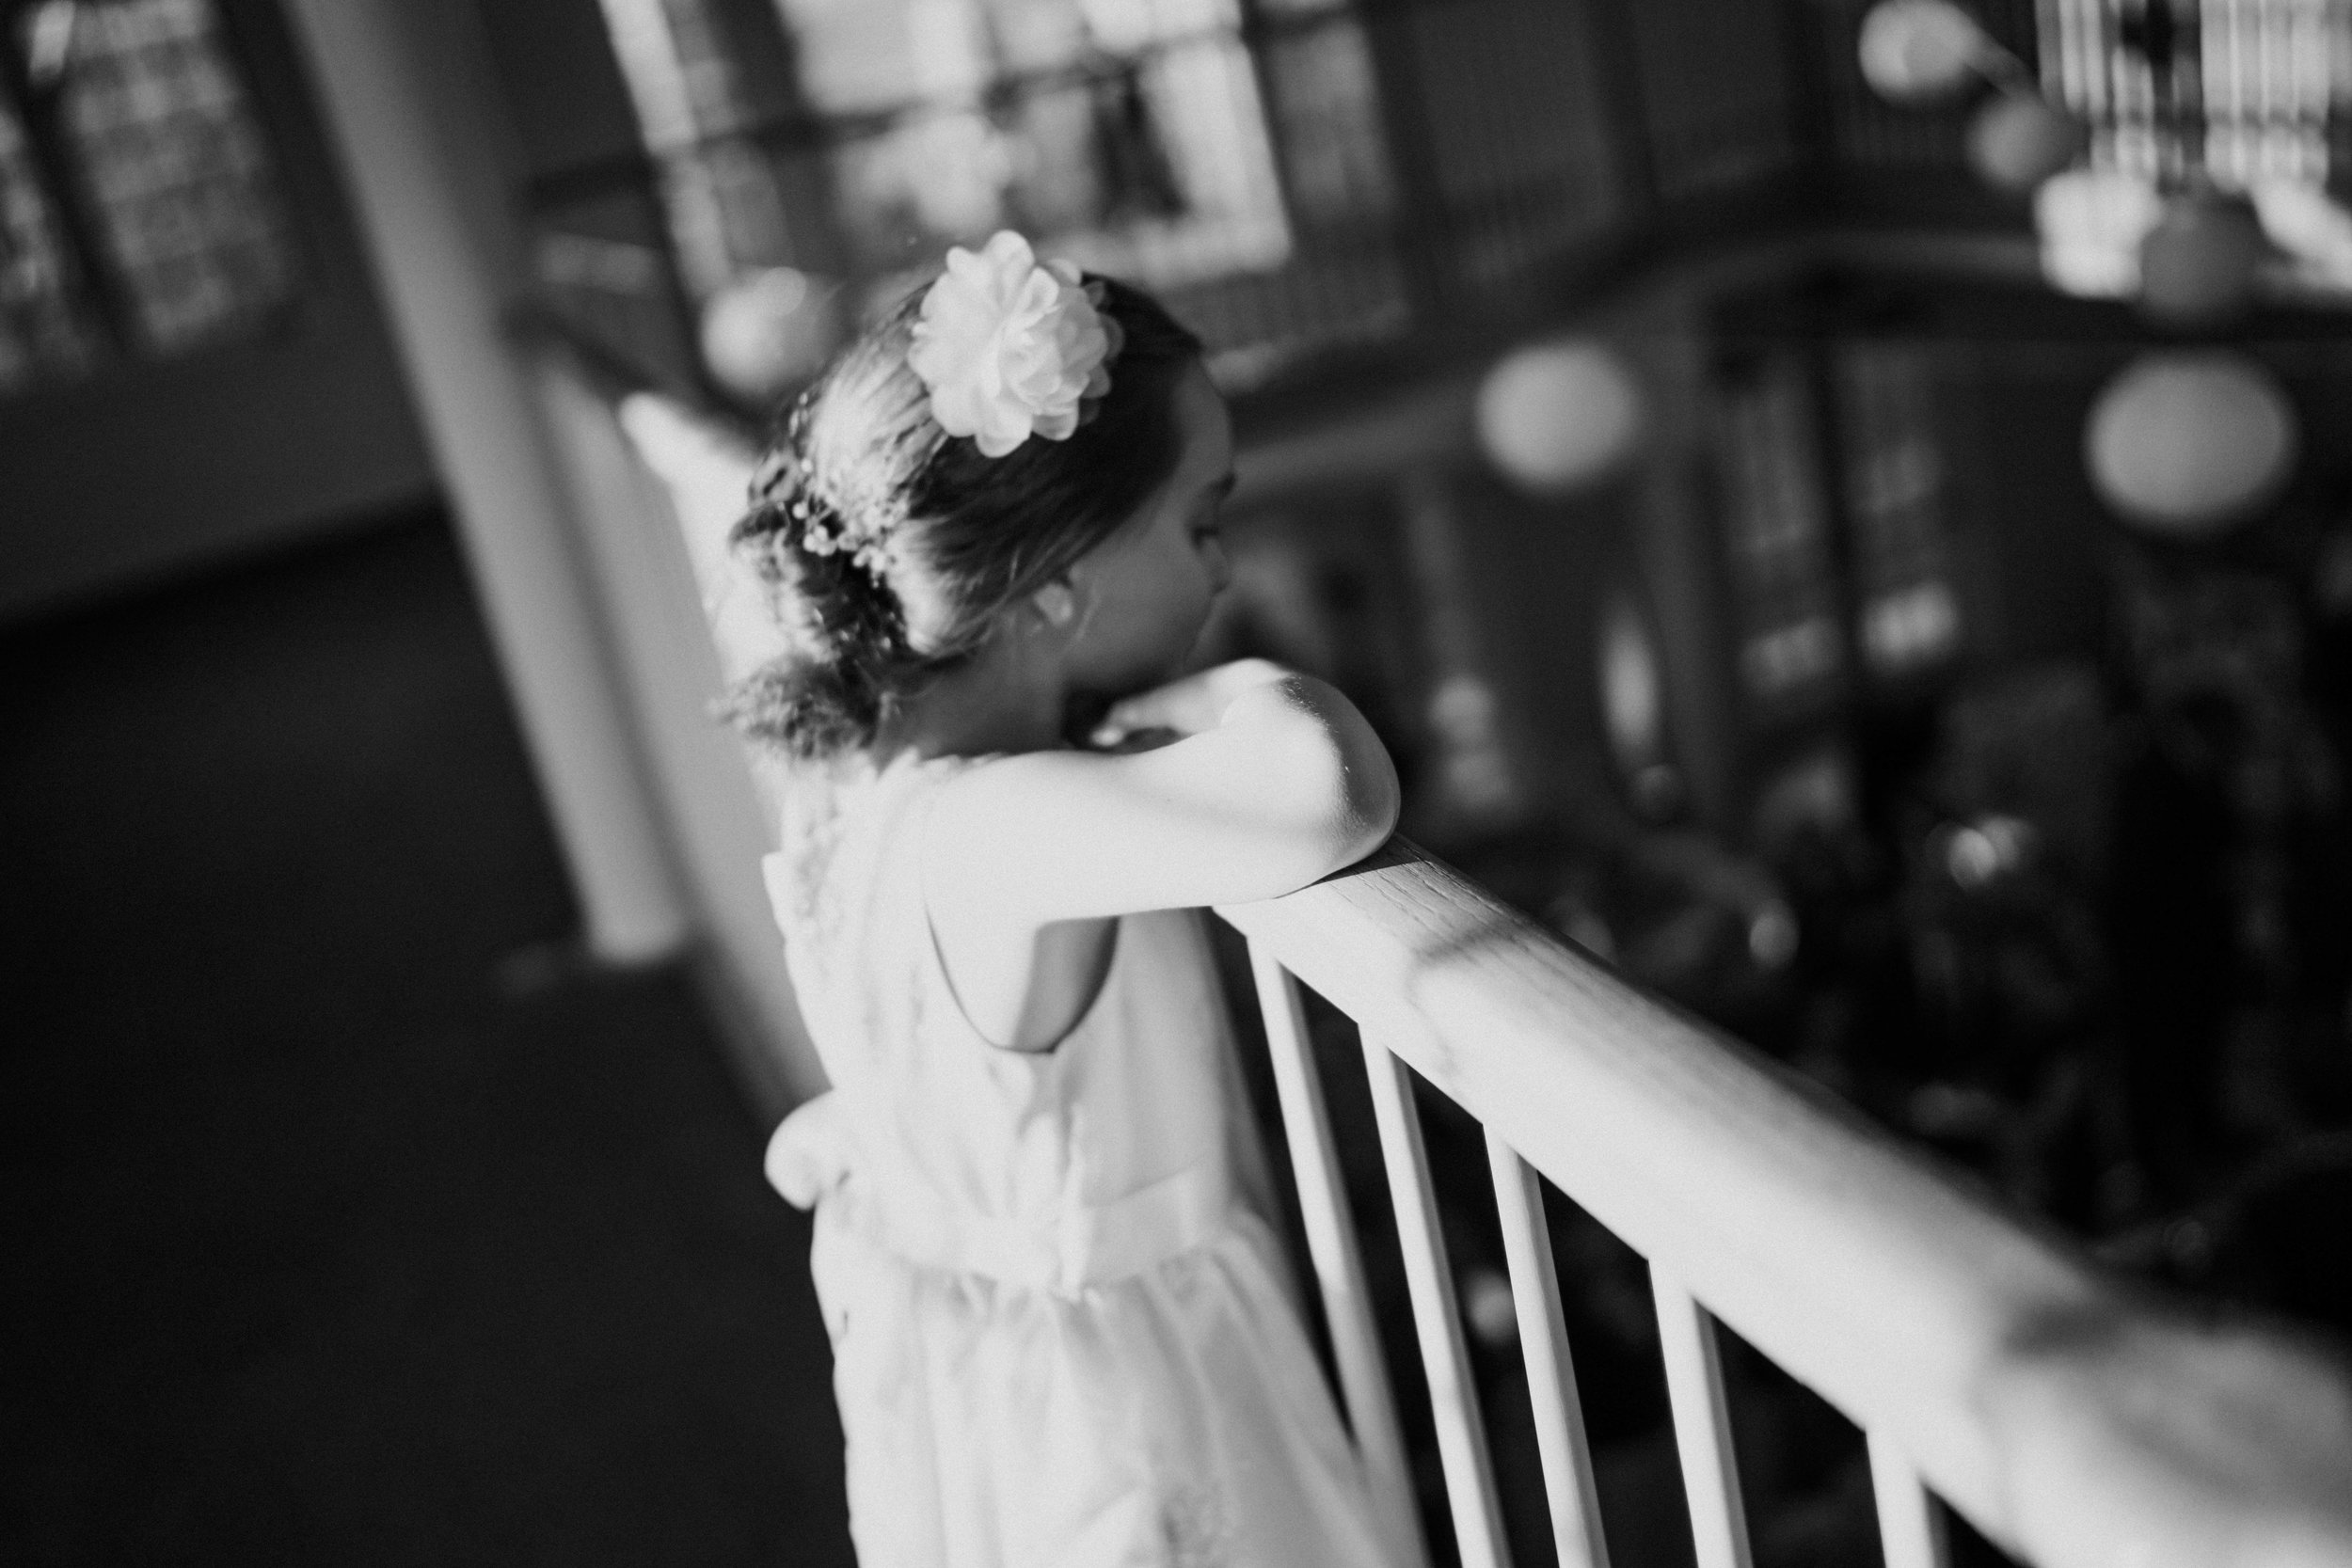 denver wedding photographer lioncrest manor in lyons ben and mali -DSC06621.jpg